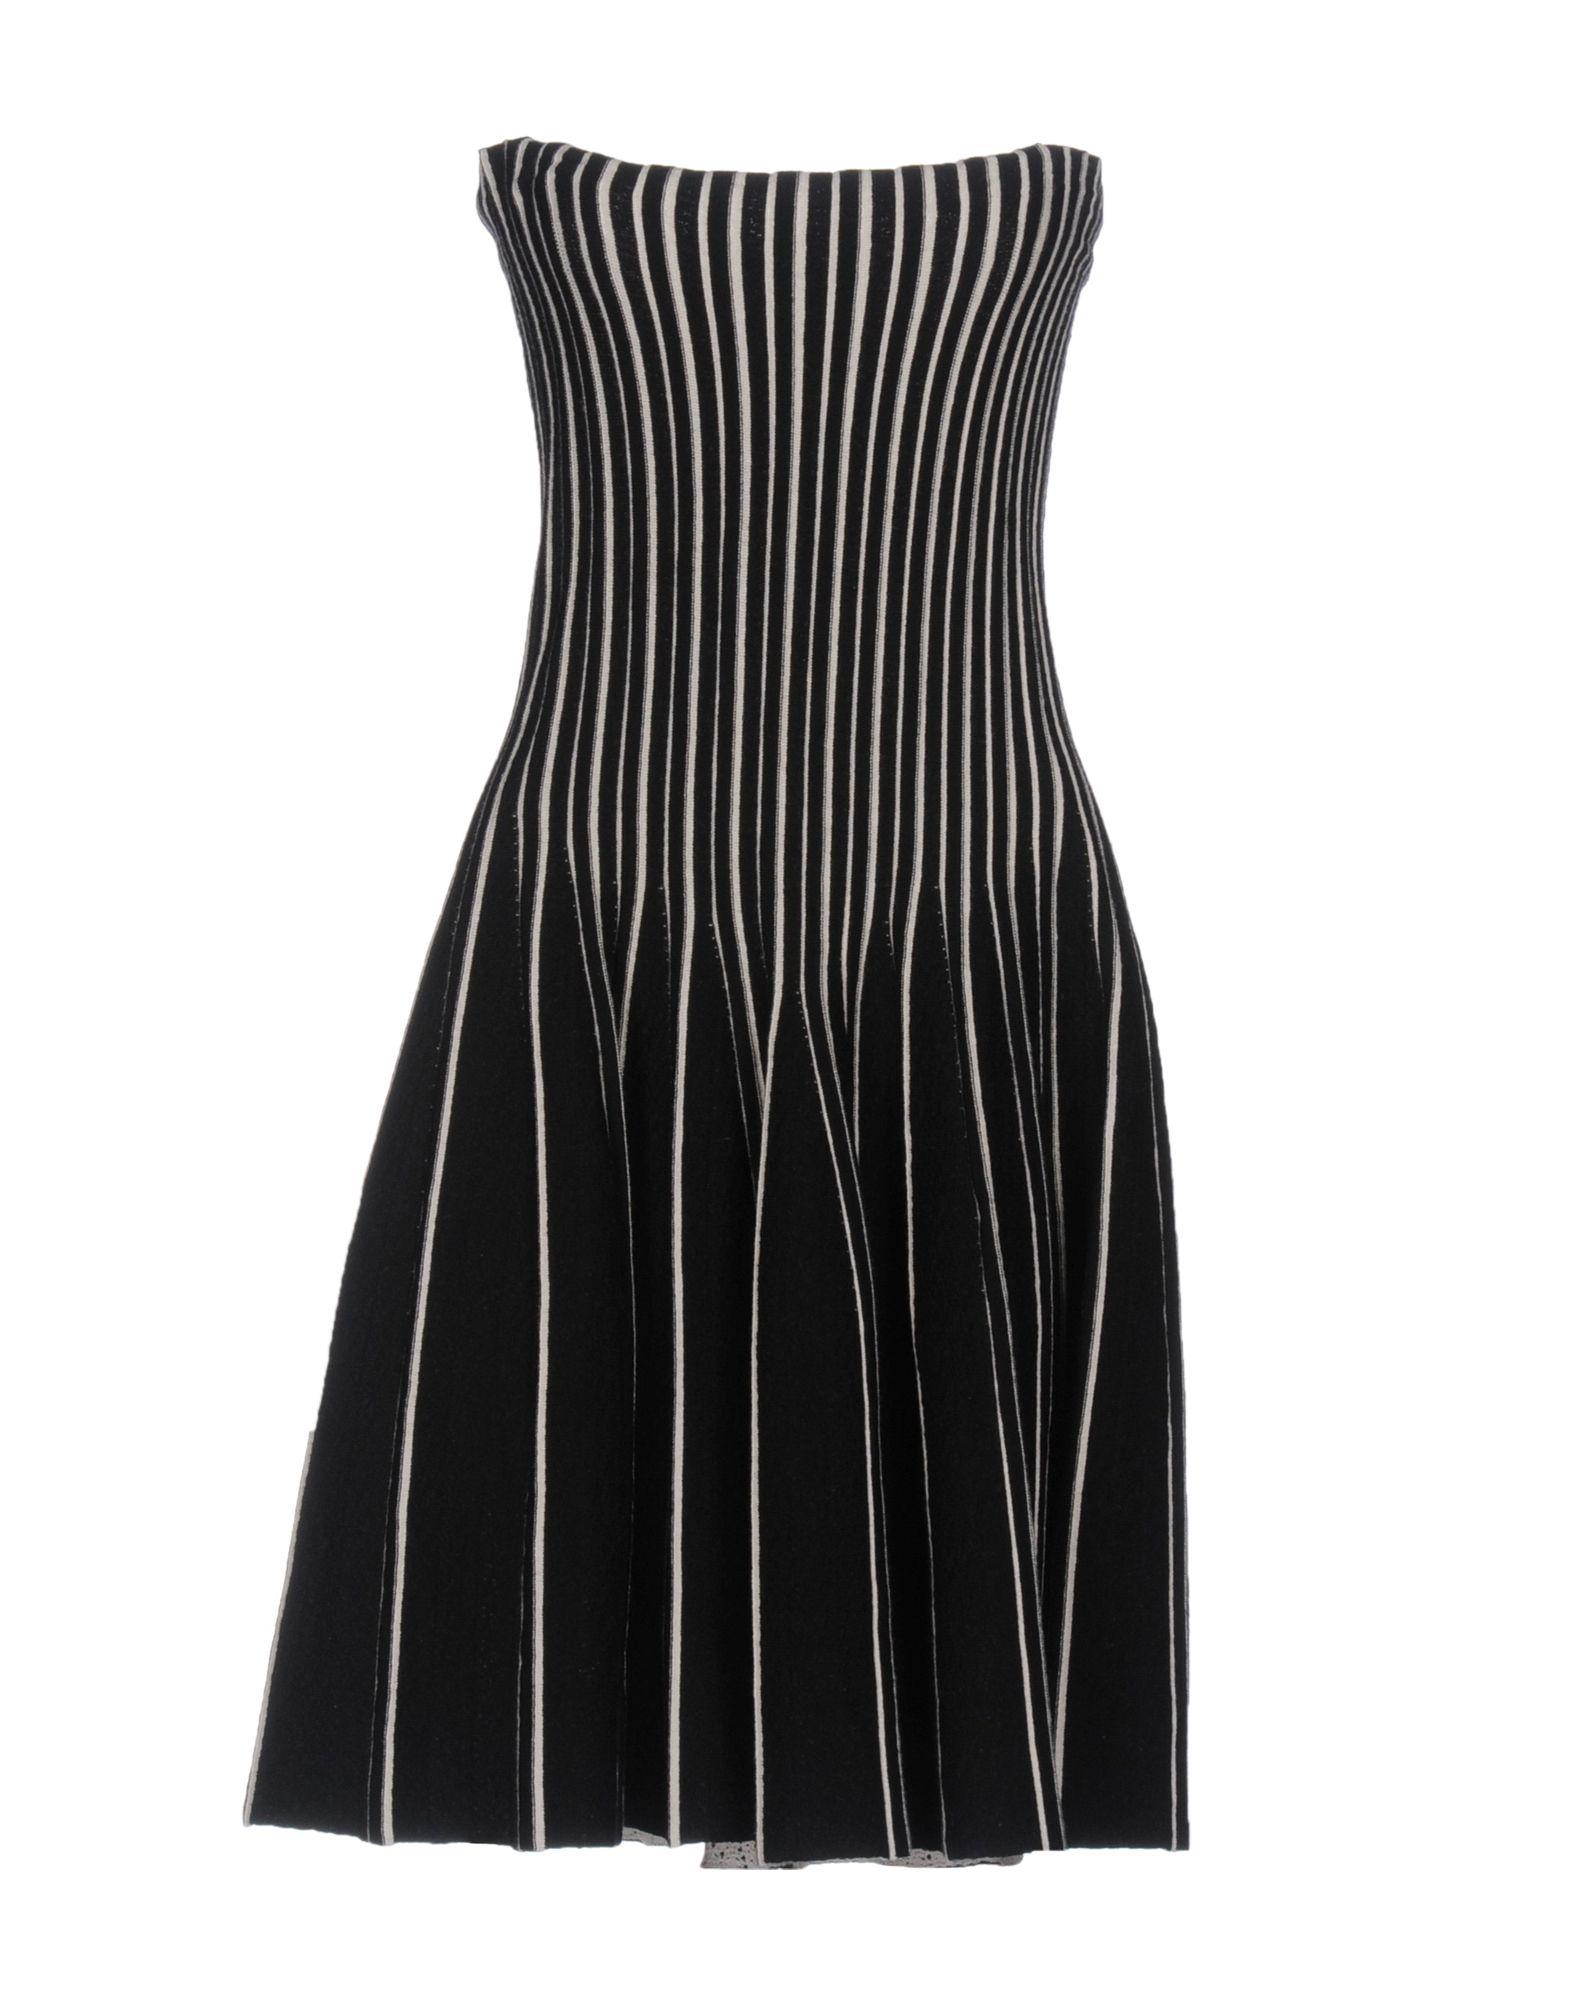 ORIGAMI KNITWEAR by PATRIZIA FERRETTI Короткое платье платье quelle patrizia dini by heine 66450